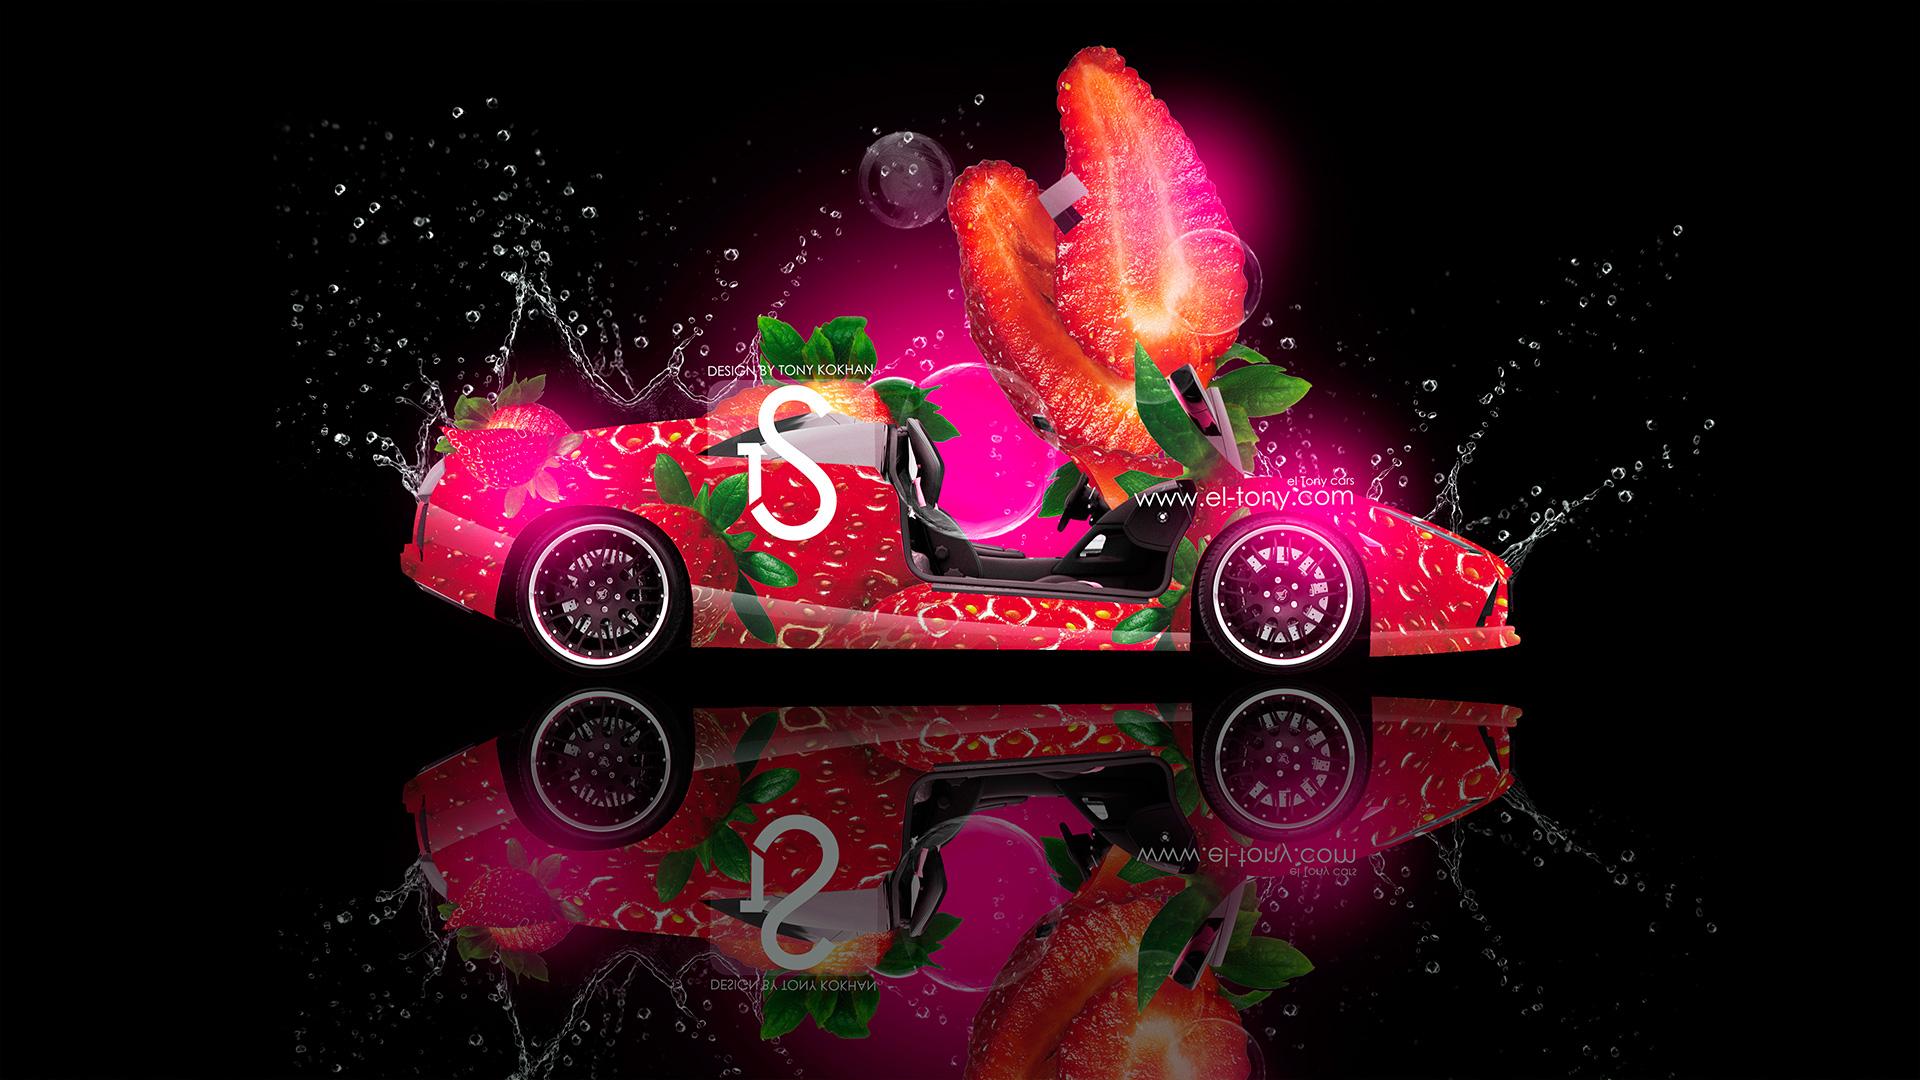 Lamborghini Murcielago Strawberry Fruit Car 2013 HD Wallpapers Design 1920x1080